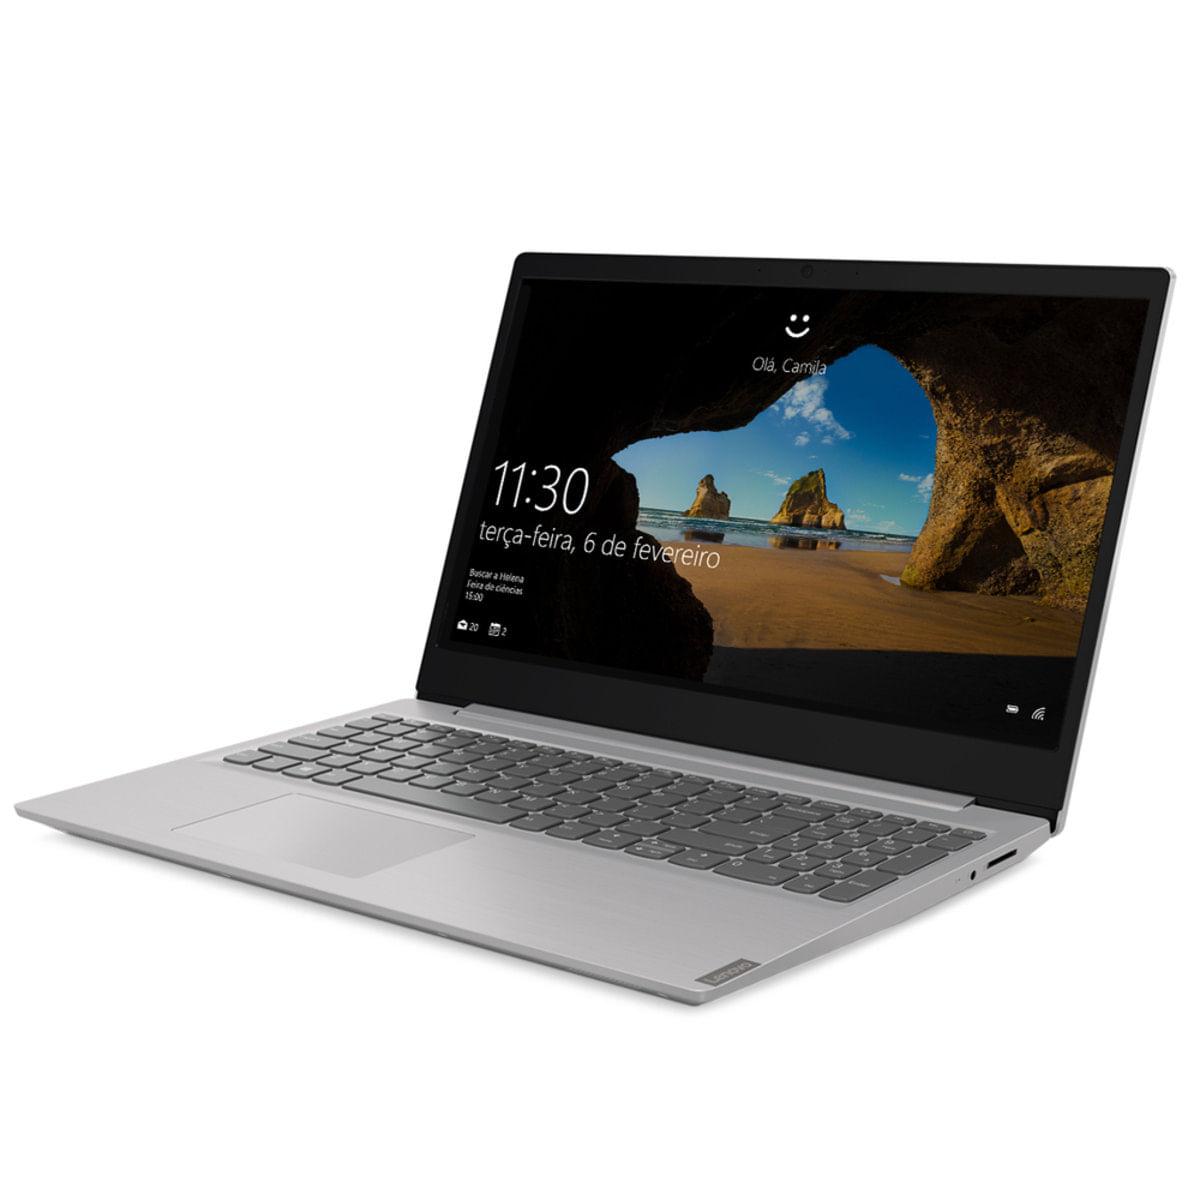 Ultrabook - Lenovo 81s90000br I7-8565u 2.00ghz 12gb 256gb Ssd Geforce Mx110 Windows 10 Professional Ideapad S145 15,6